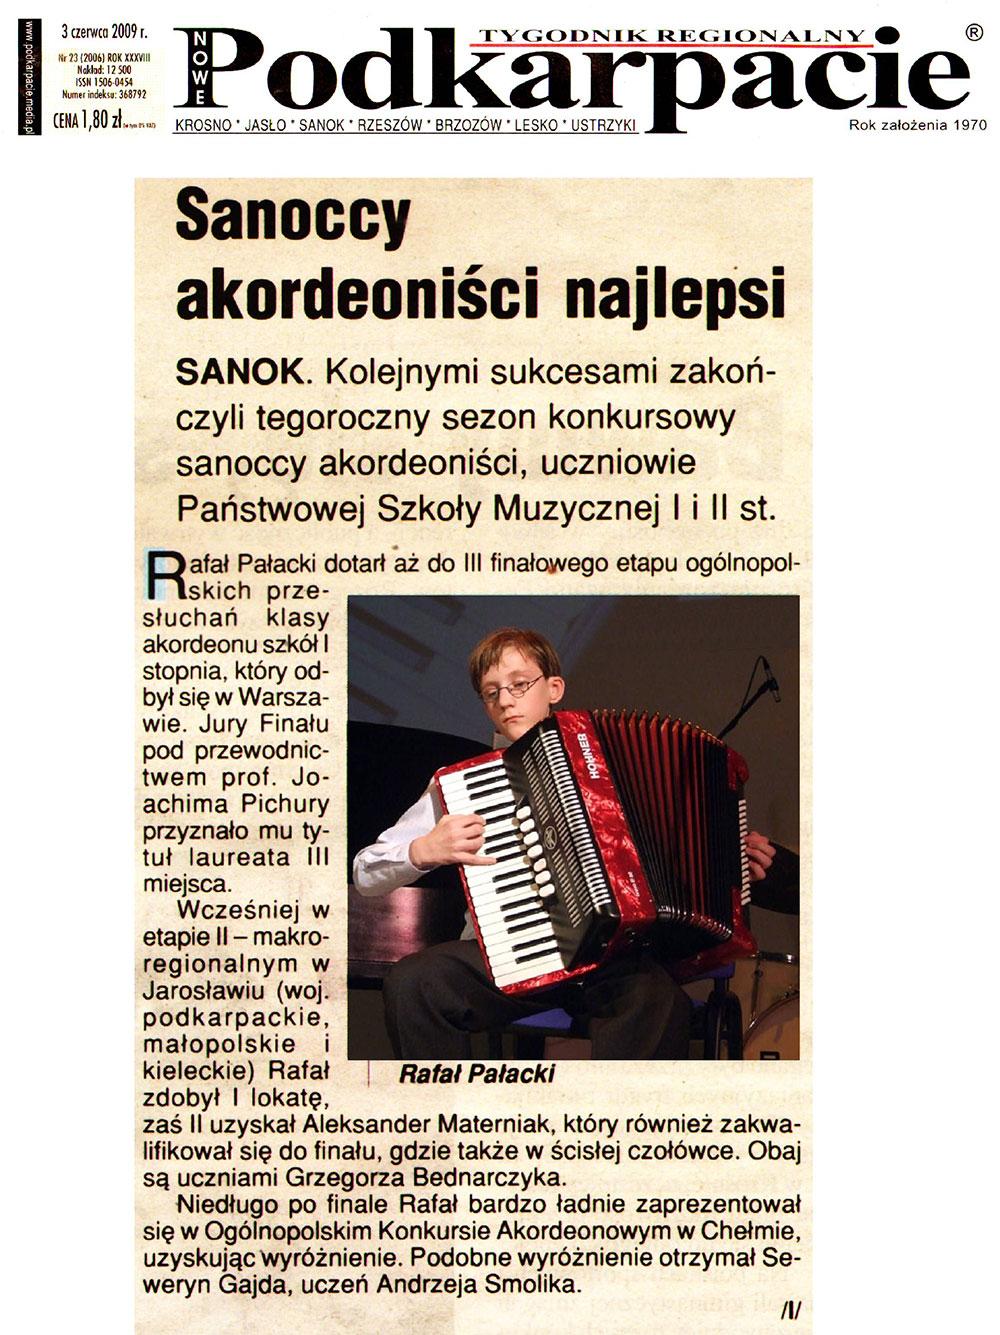 Prasa-Sanoccy-akordeoniści-najlepsi